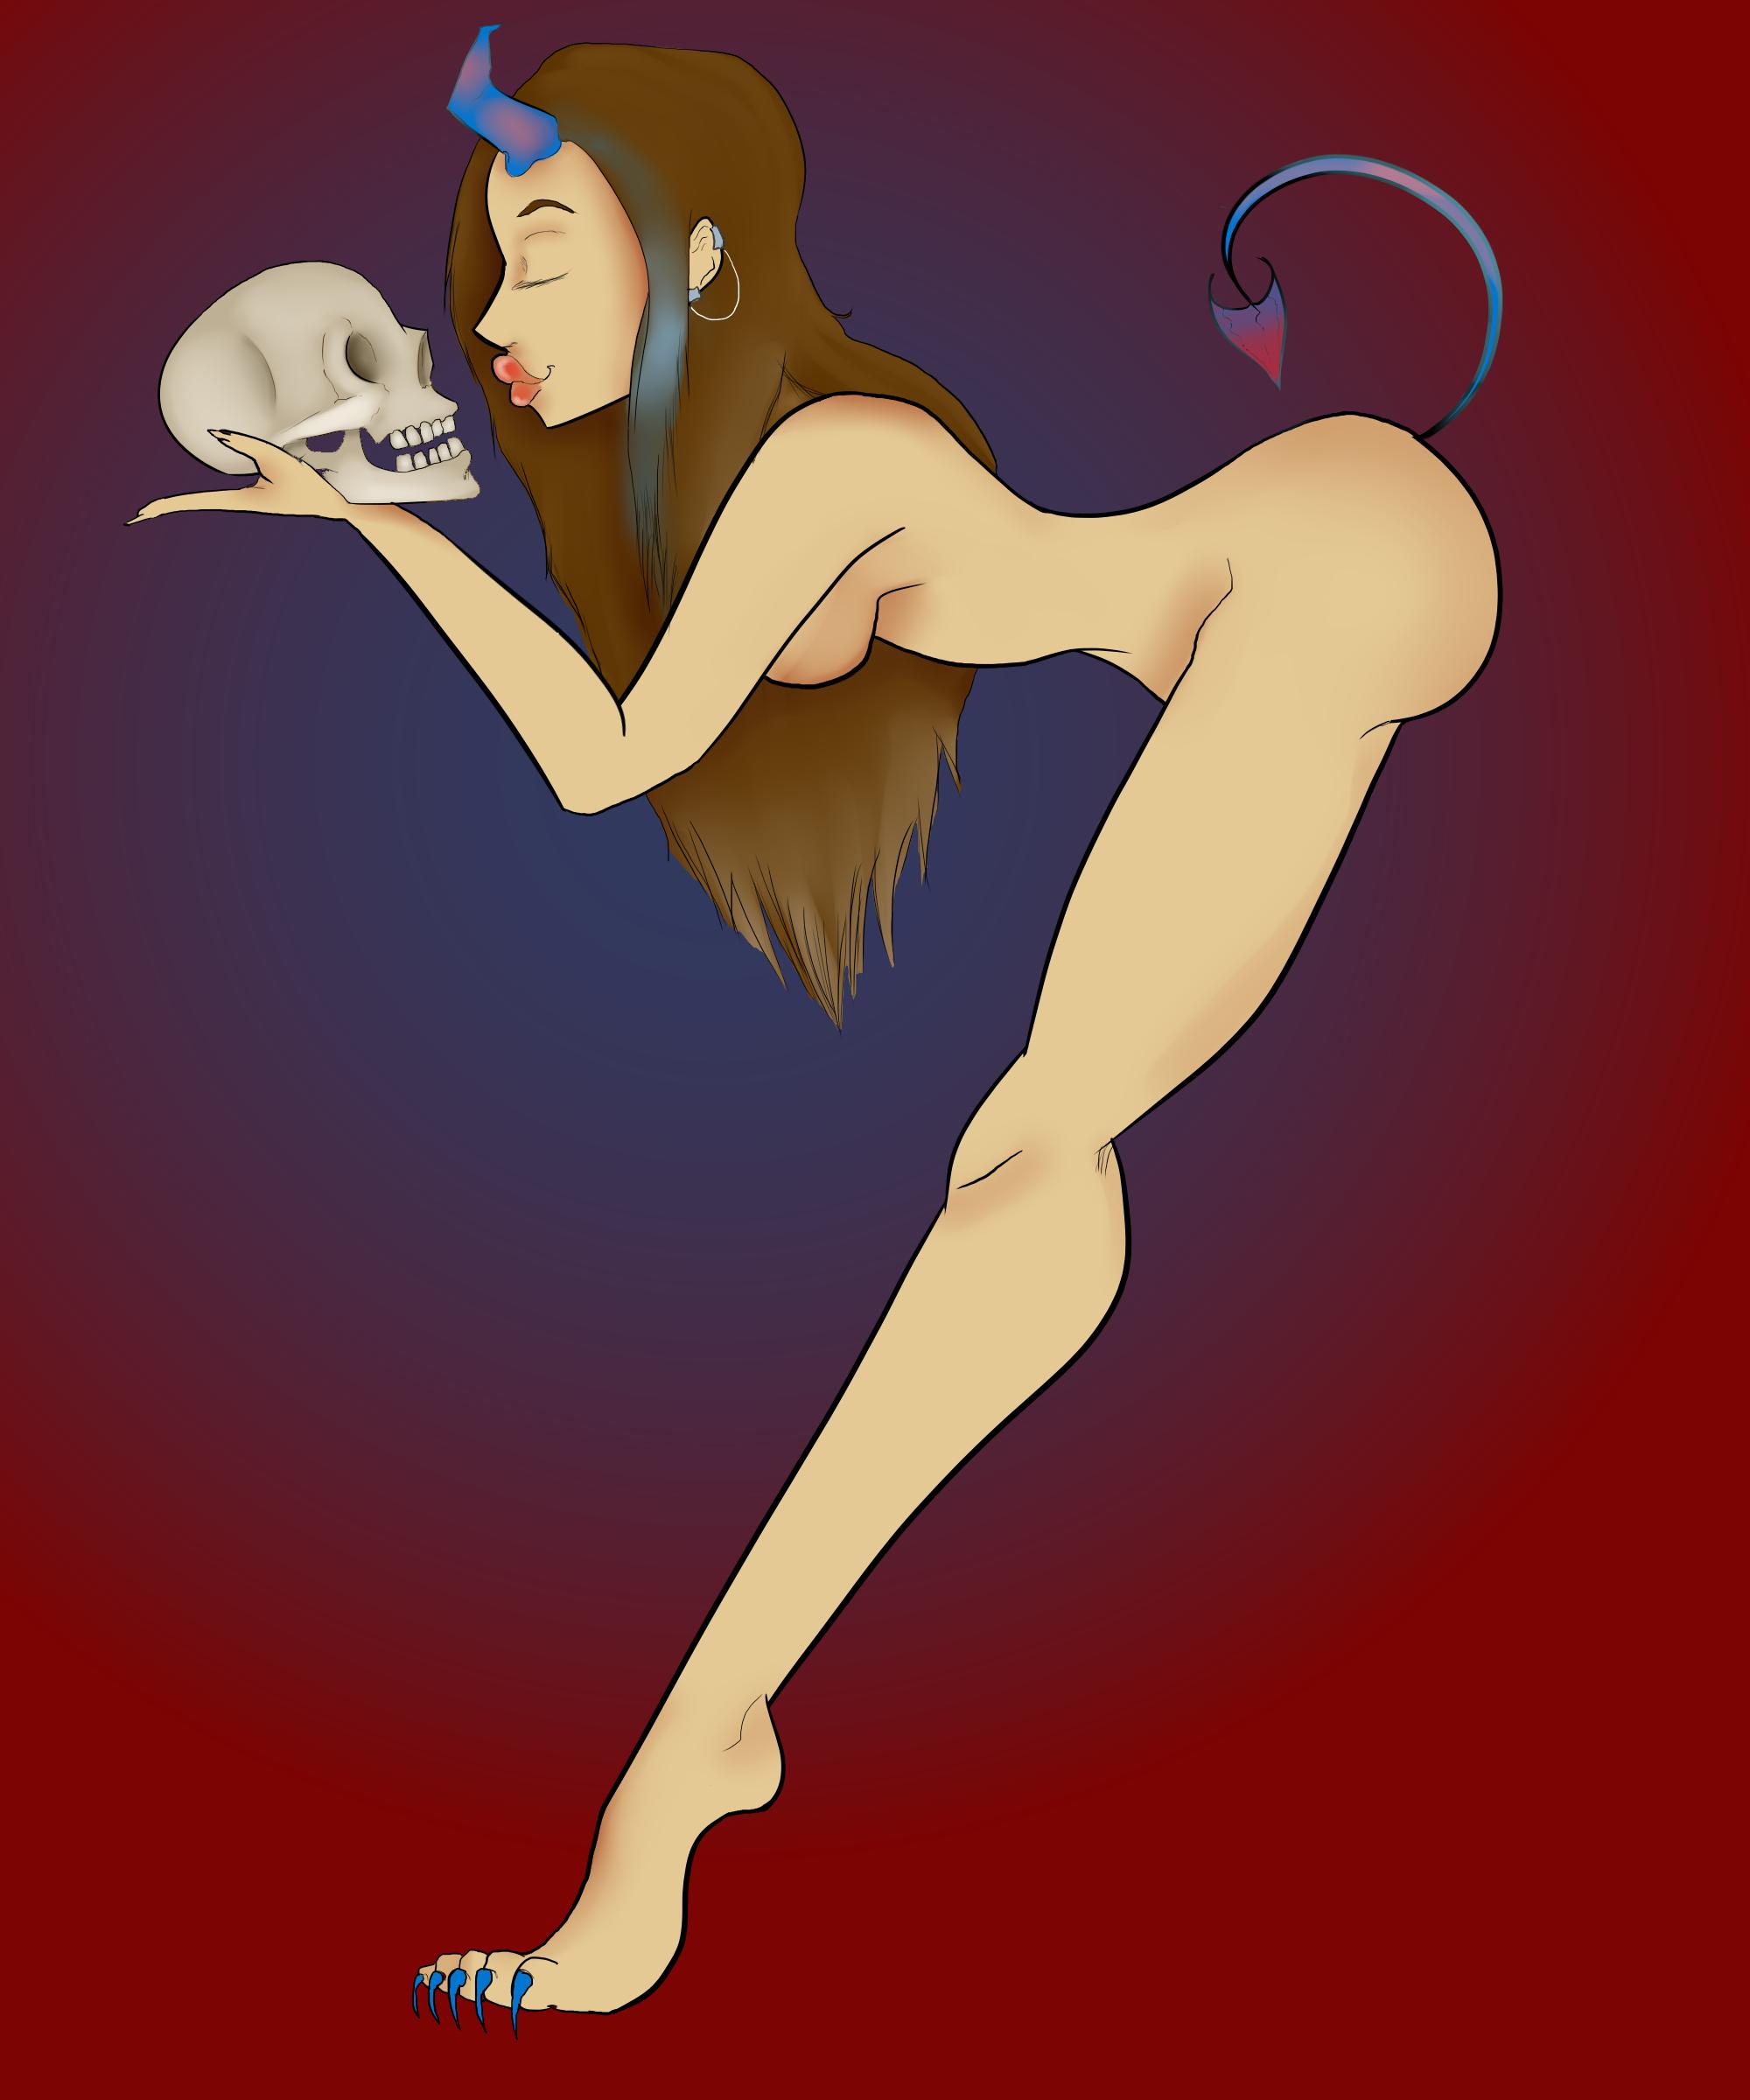 Ladykiller by Nefepants